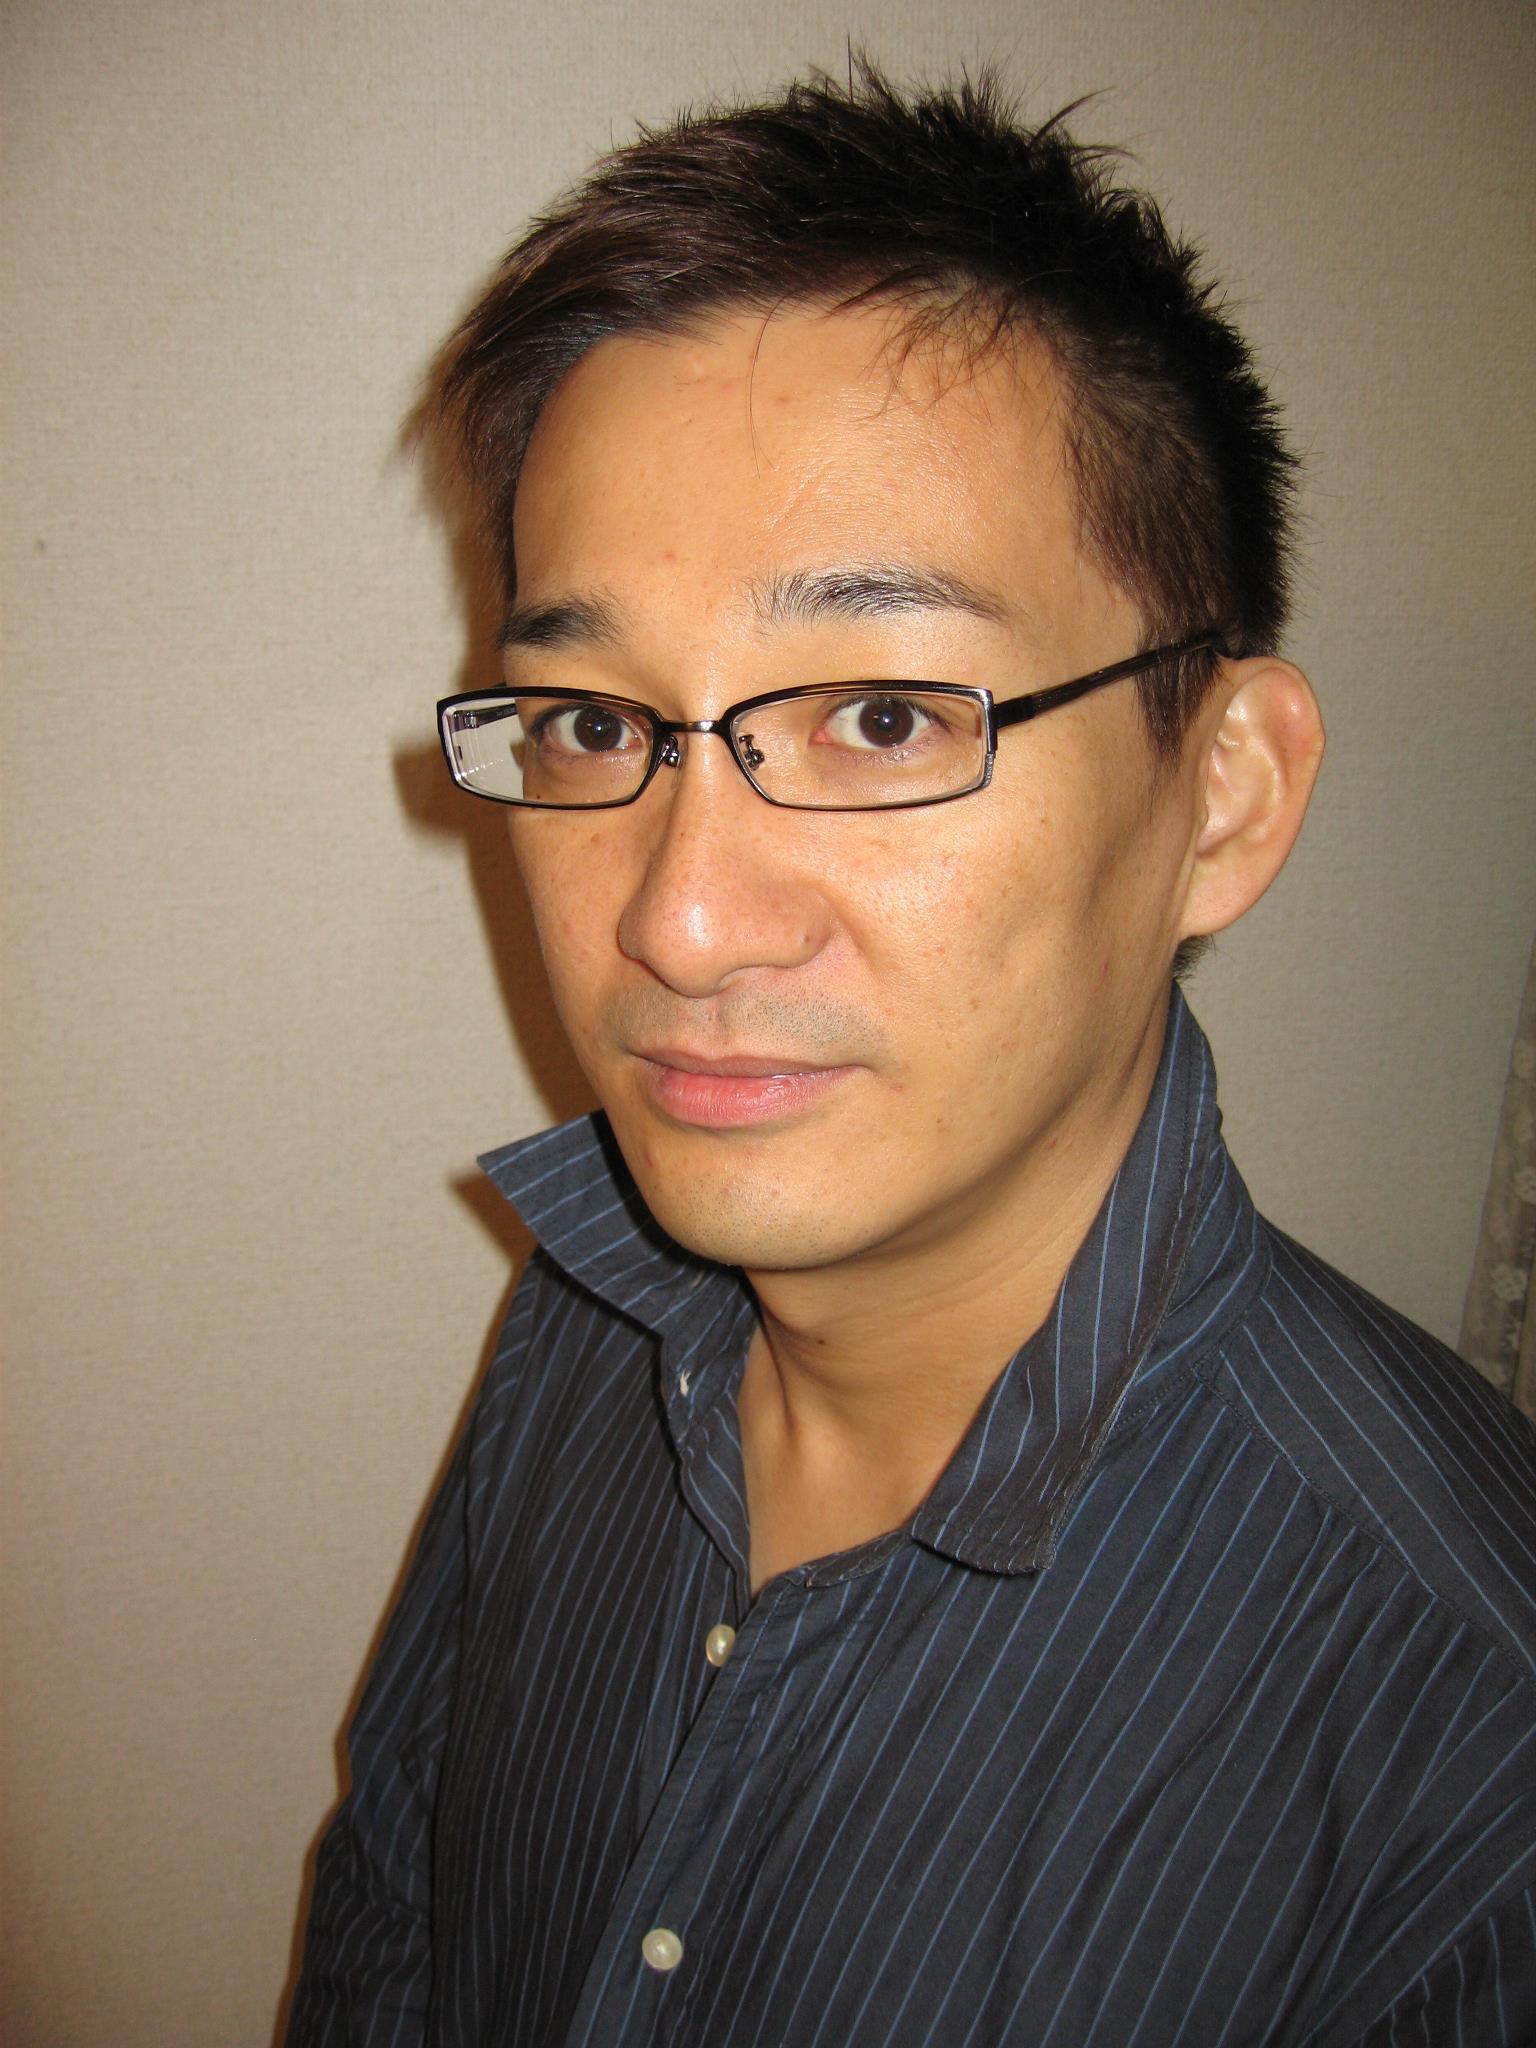 渡邊弘の履歴_e0110091_17225387.jpg